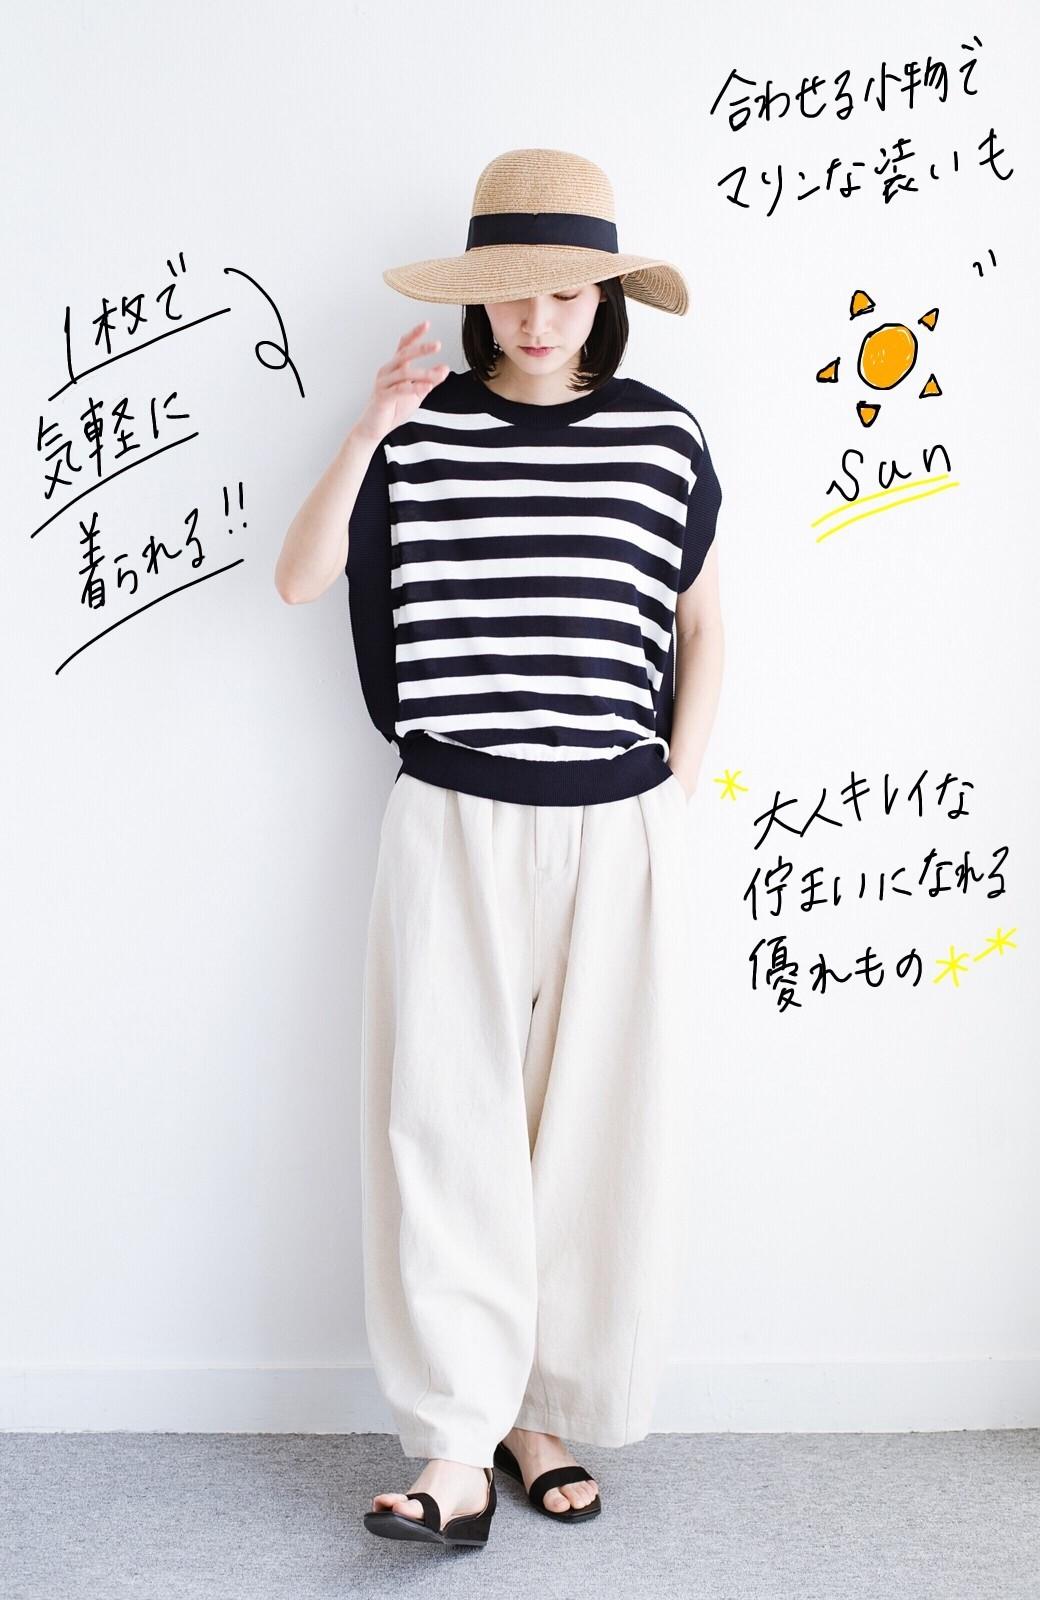 haco! カットソー感覚で着られる 洗えるオトナニットトップス by MAKORI <ブルー系その他>の商品写真8